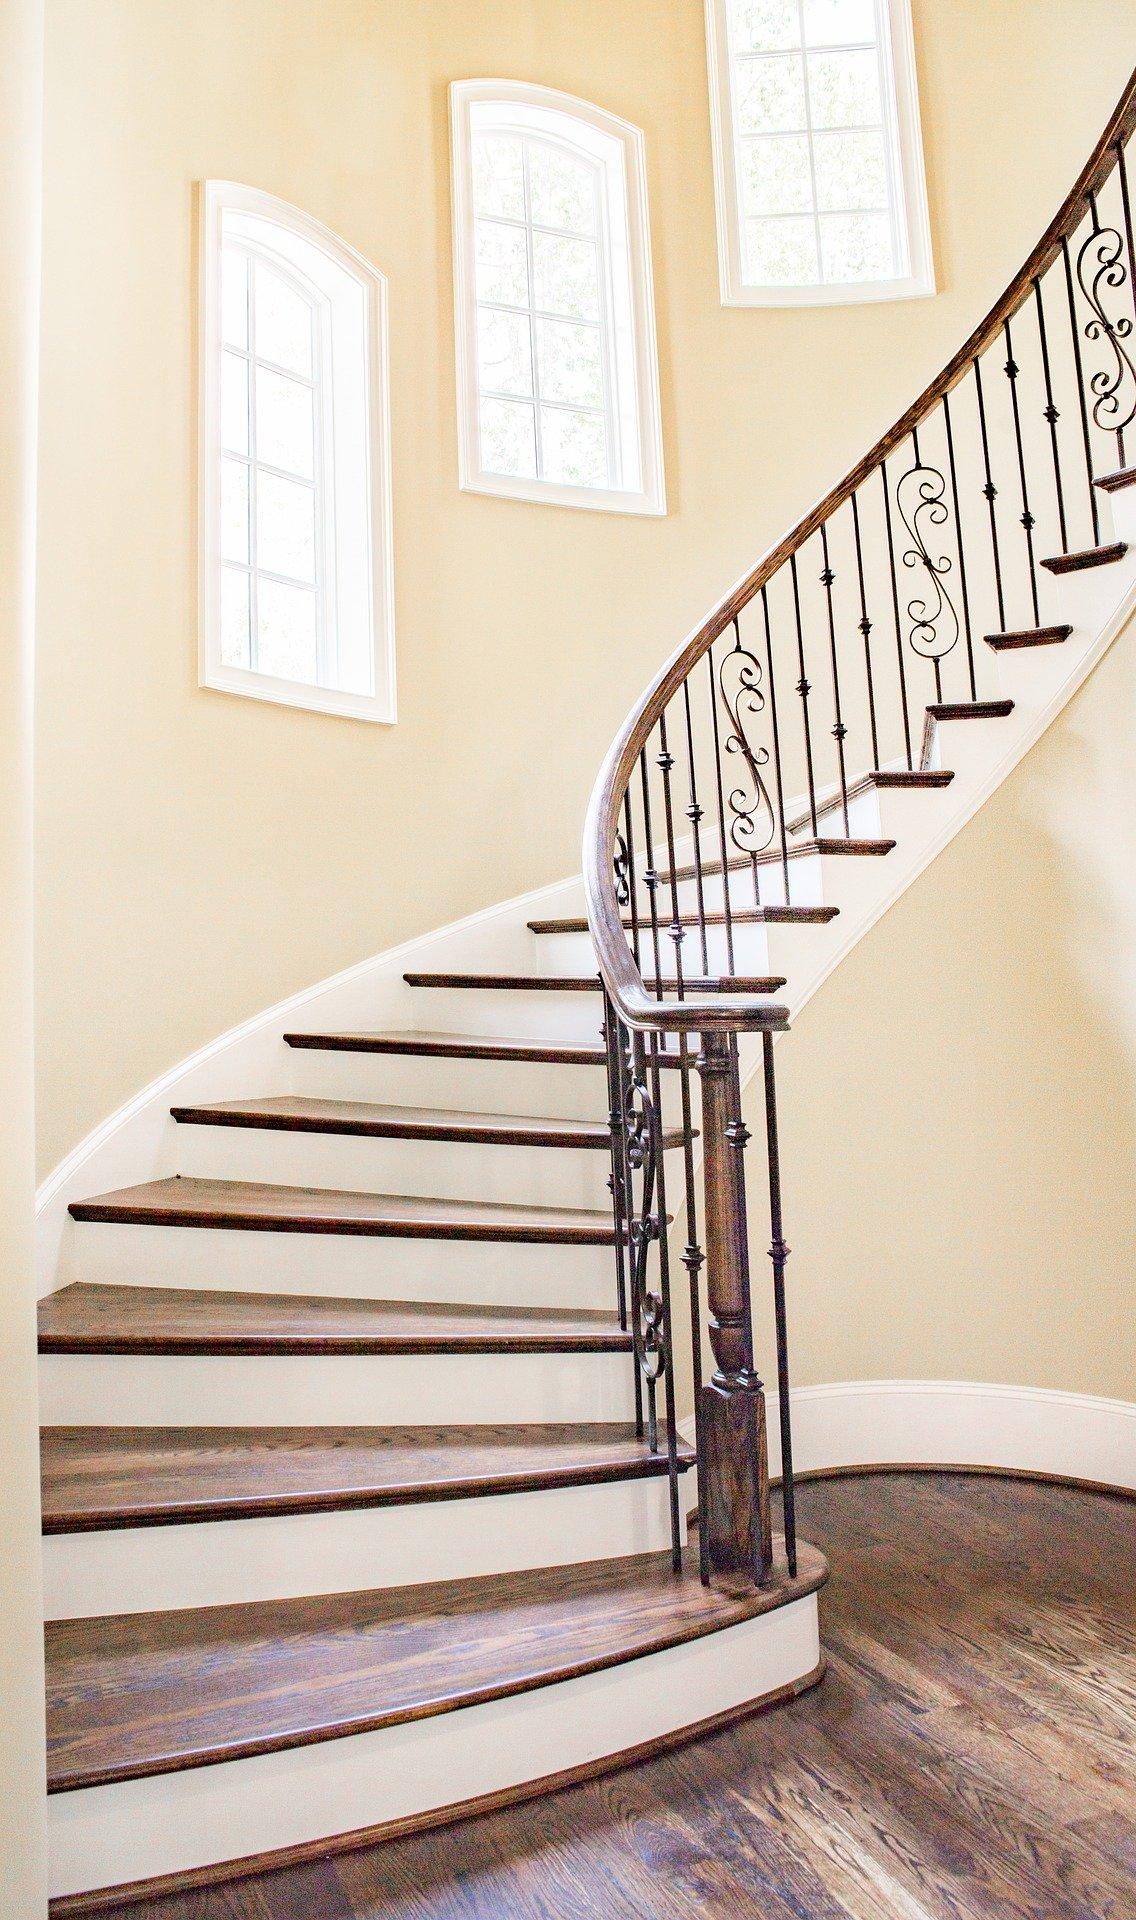 Real Estate Staircase Proprcopy